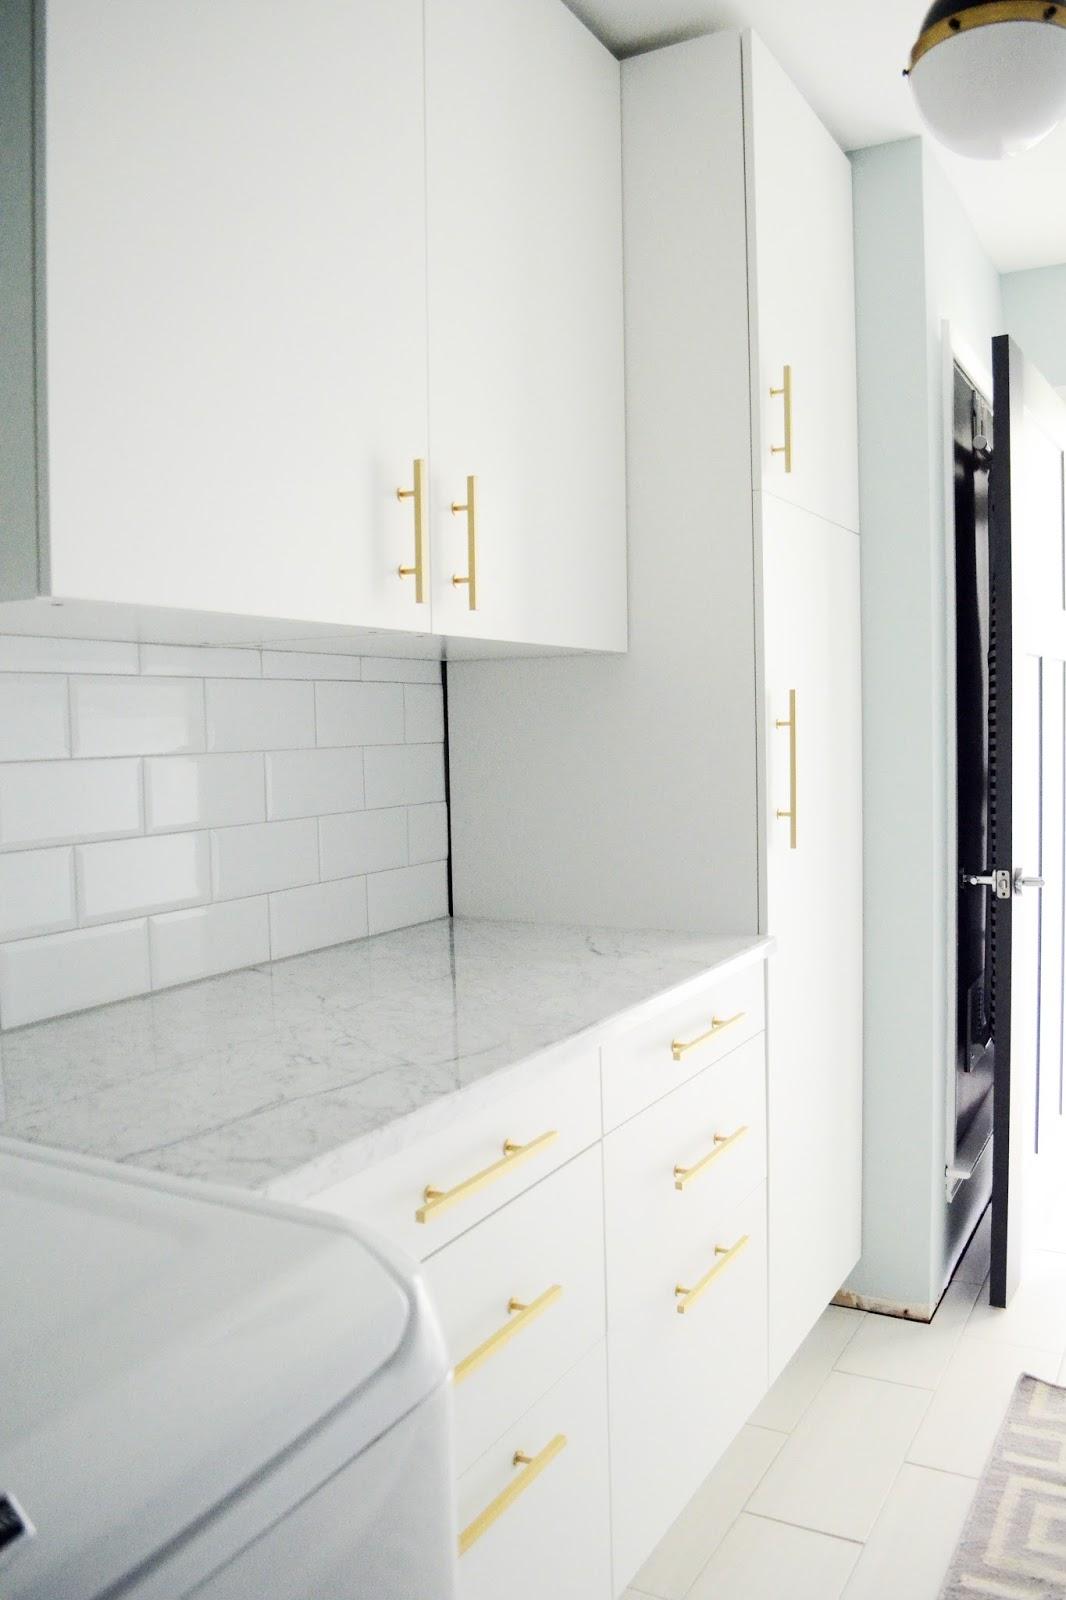 Famous 1200 X 1200 Floor Tiles Tiny 12X24 Floor Tile Designs Regular 1X2 Subway Tile 2X2 Ceiling Tiles Home Depot Youthful 2X4 Ceiling Tiles Red2X4 Ceiling Tiles Cheap Stacy   Charlie: May 2015